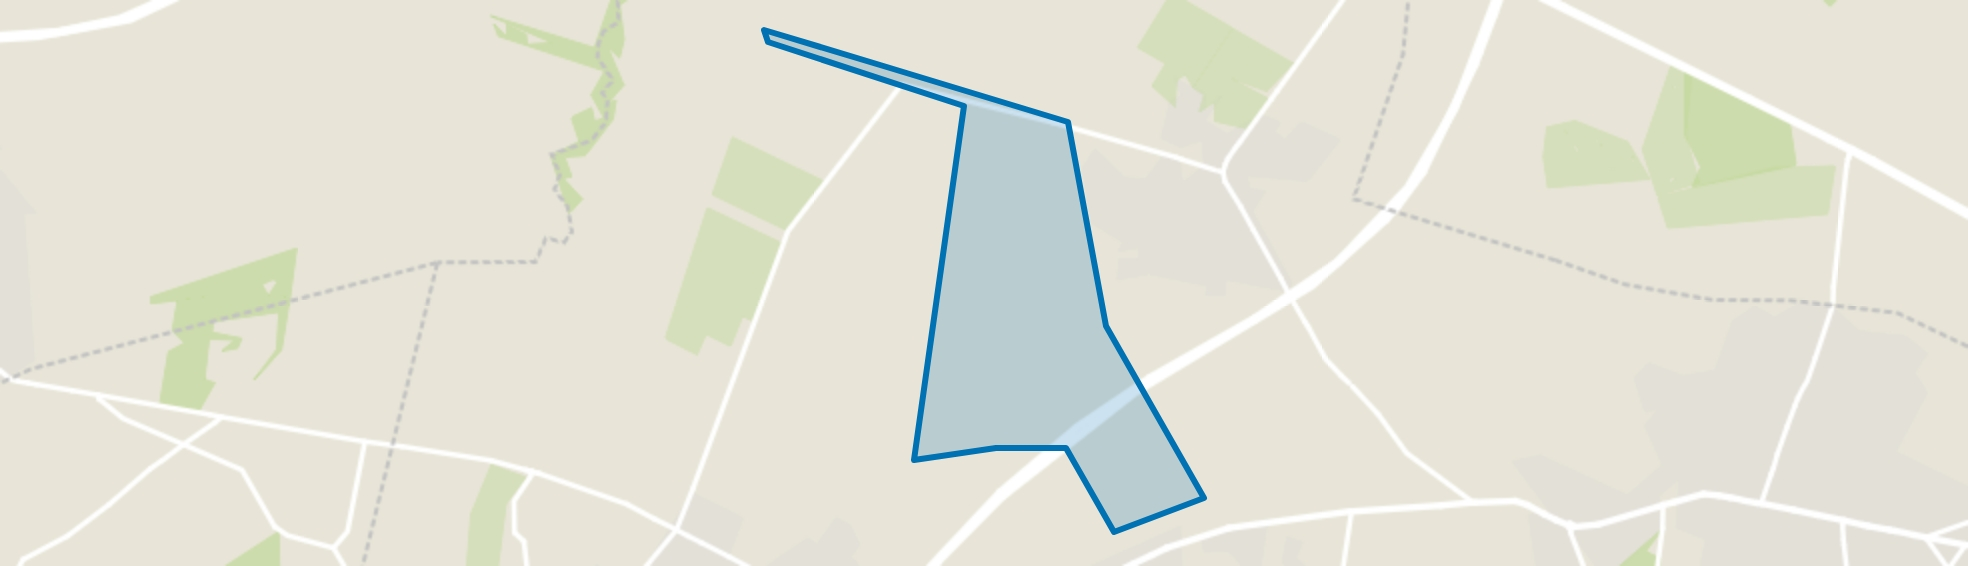 Boschhoeve, Wolfheze map